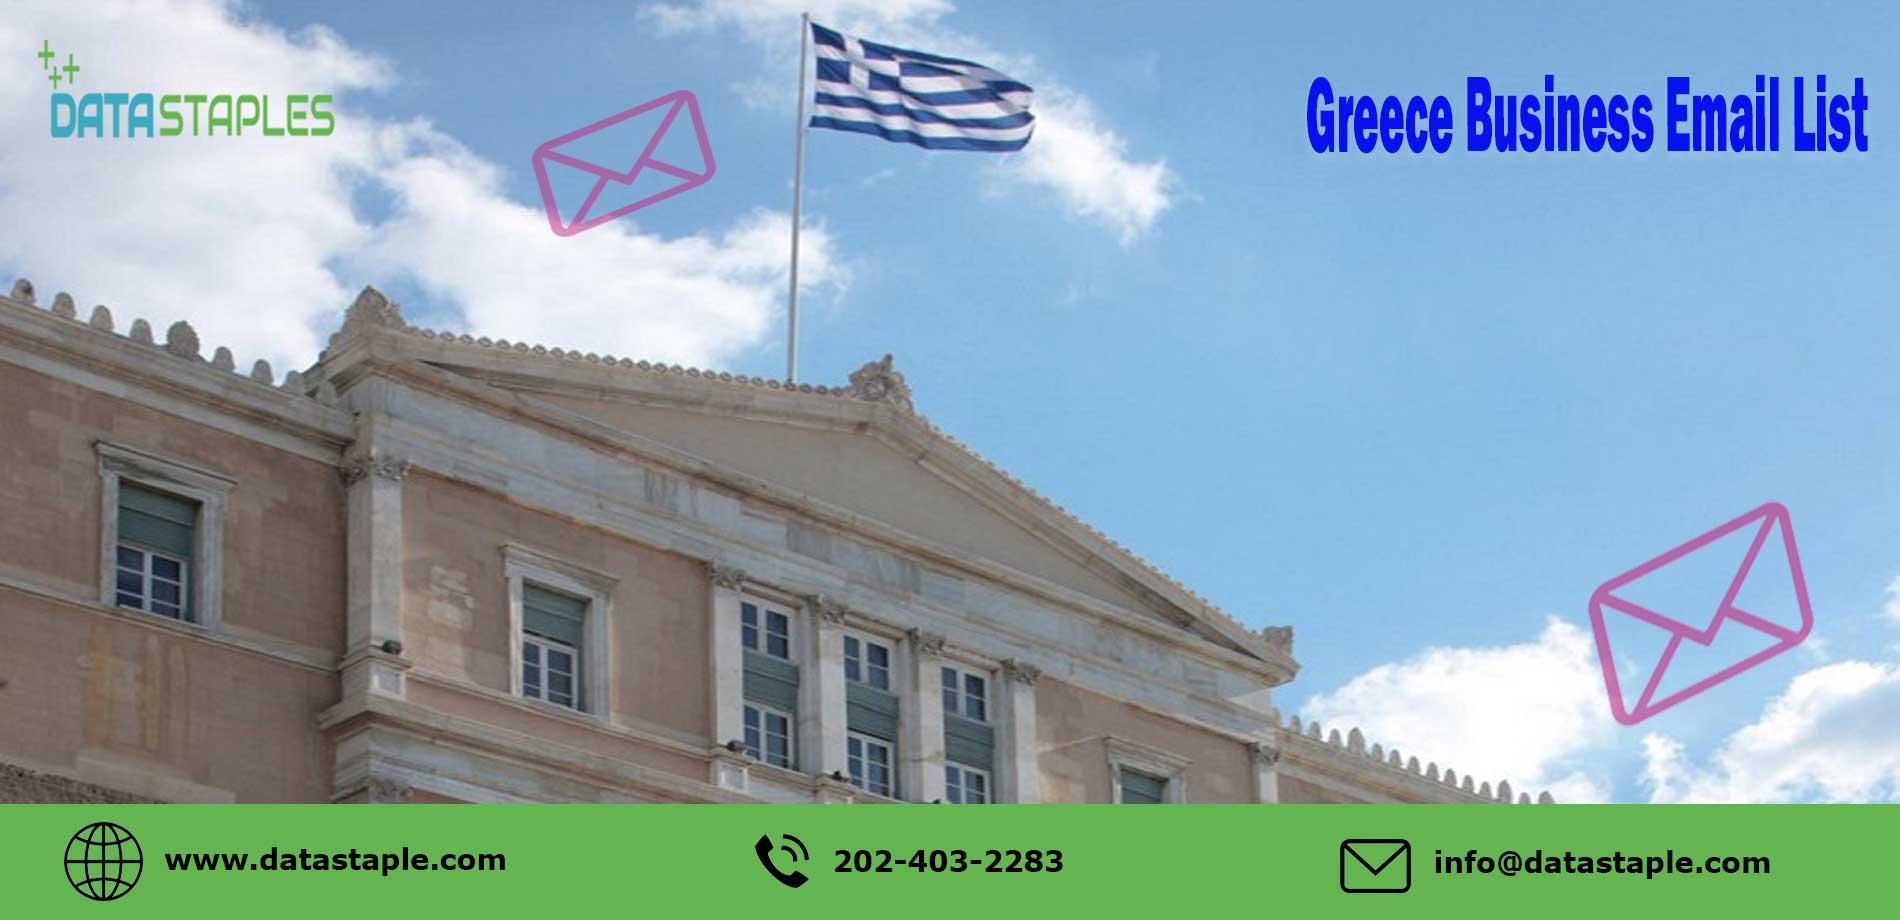 Greece Business Email List   DataStaples